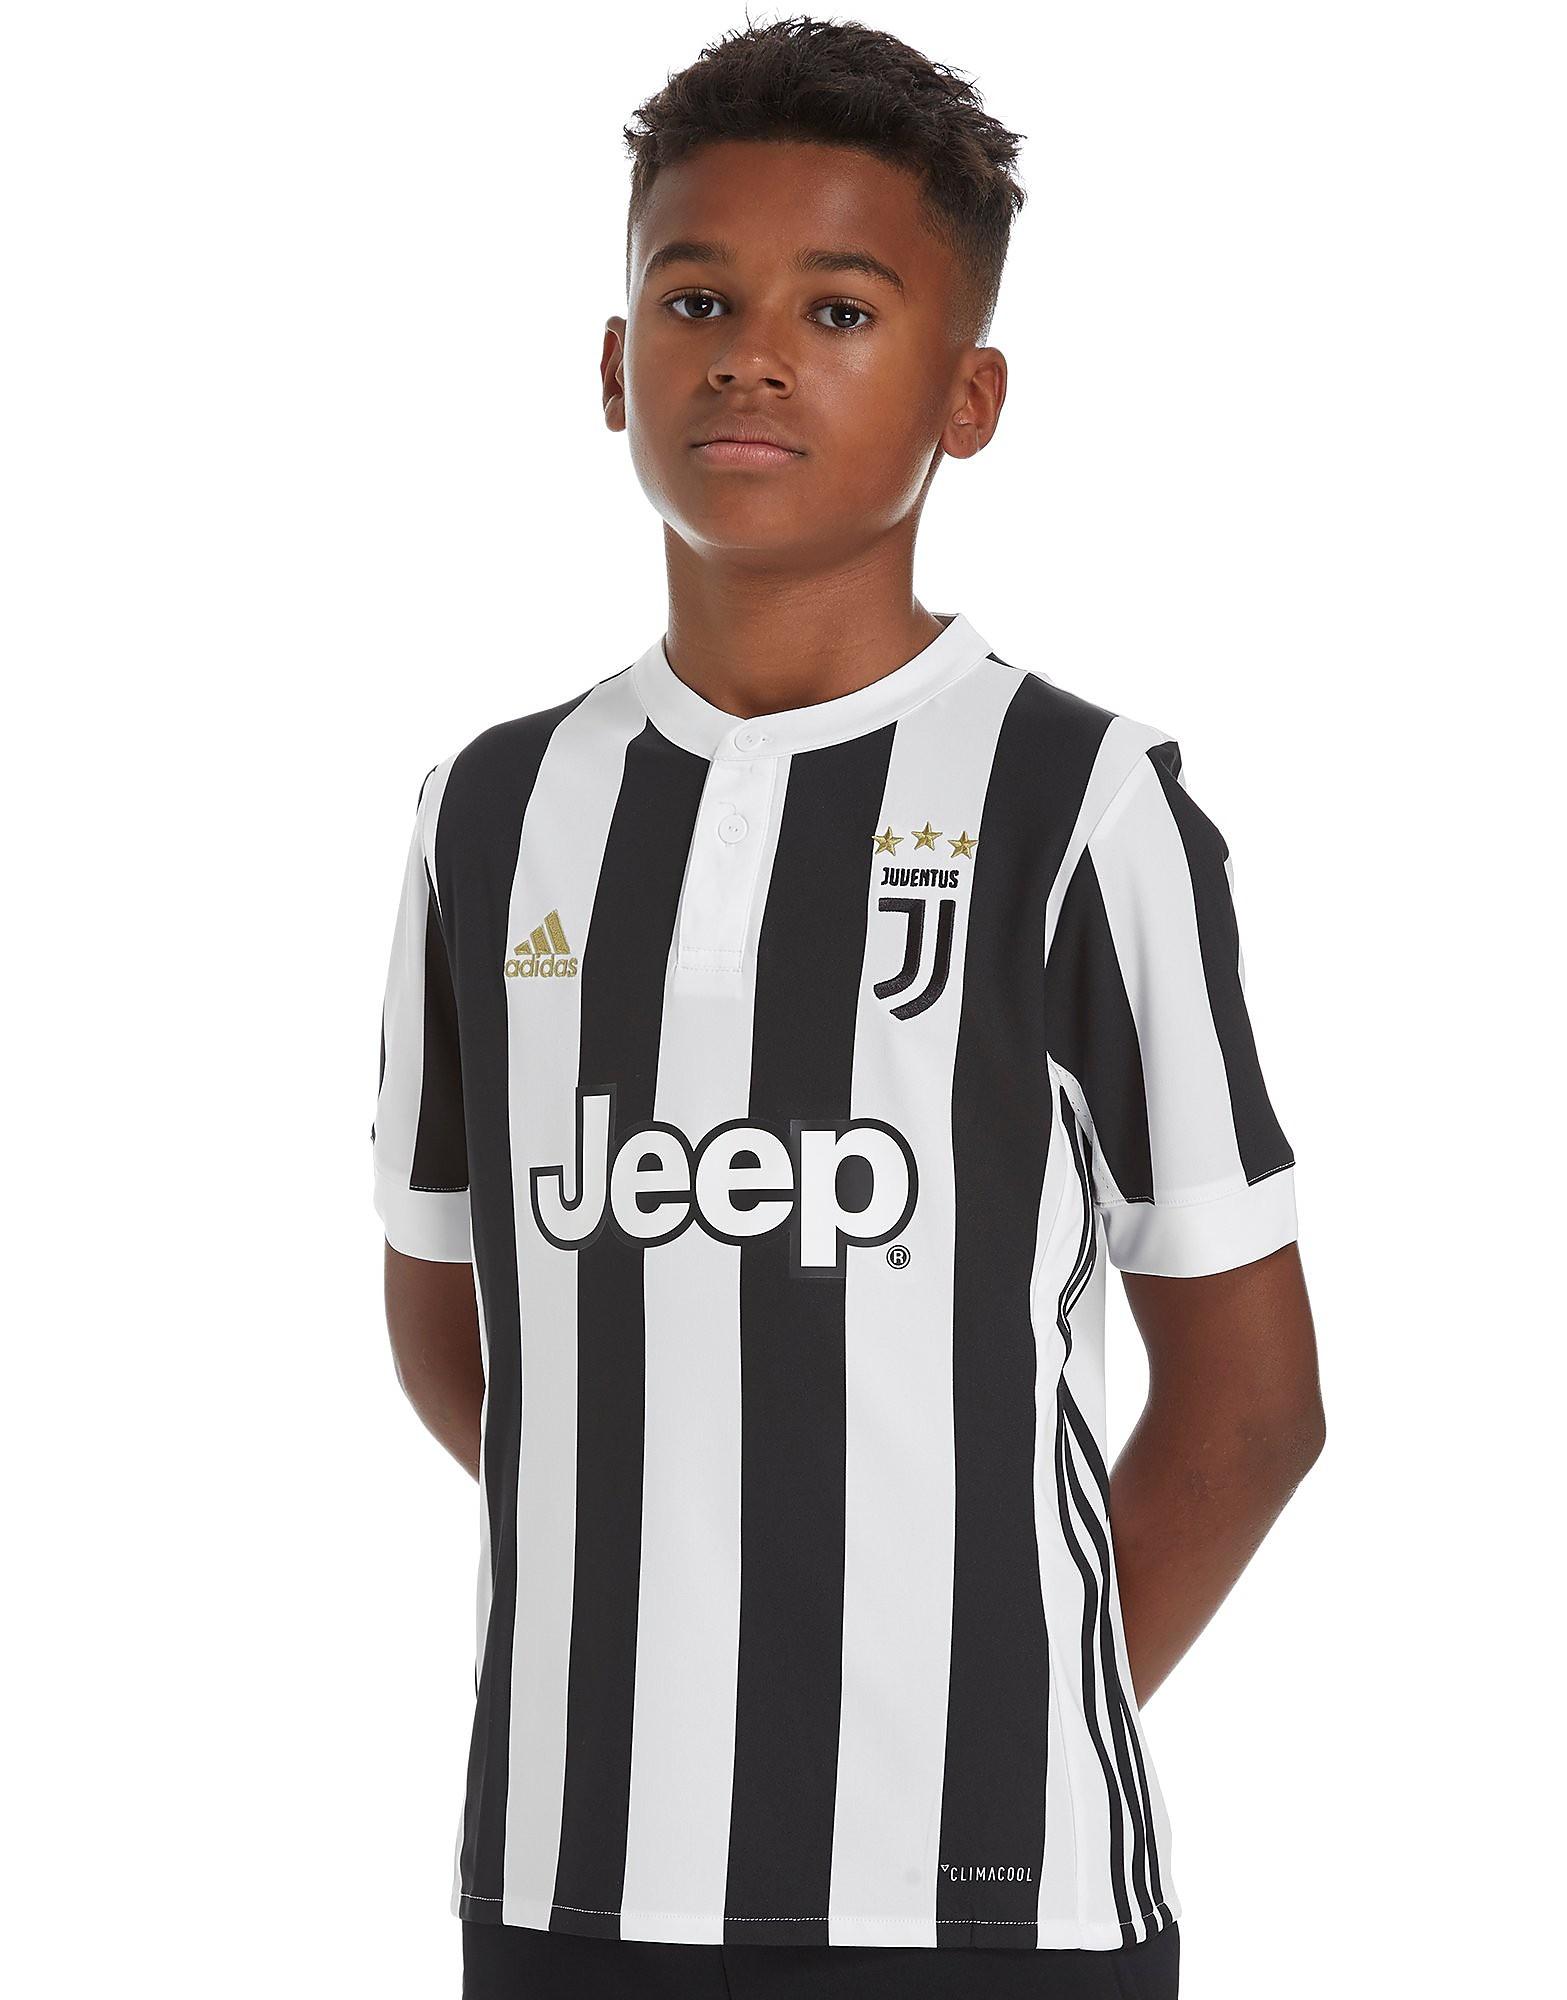 adidas Juventus 2017/18 hjemmebanetrøje Junior